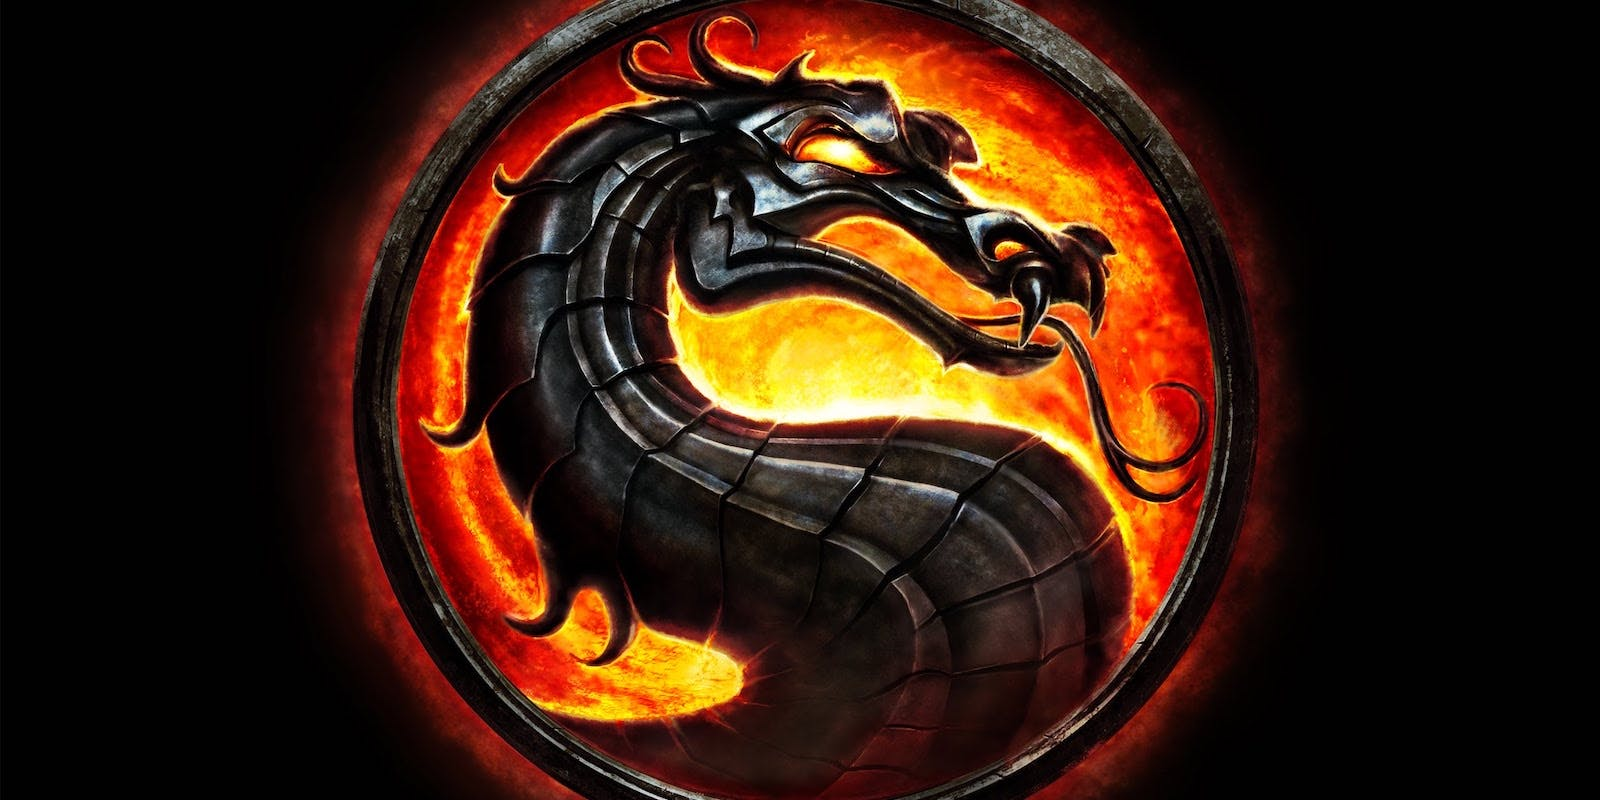 La nueva película de Mortal Kombat detalla a sus personajes